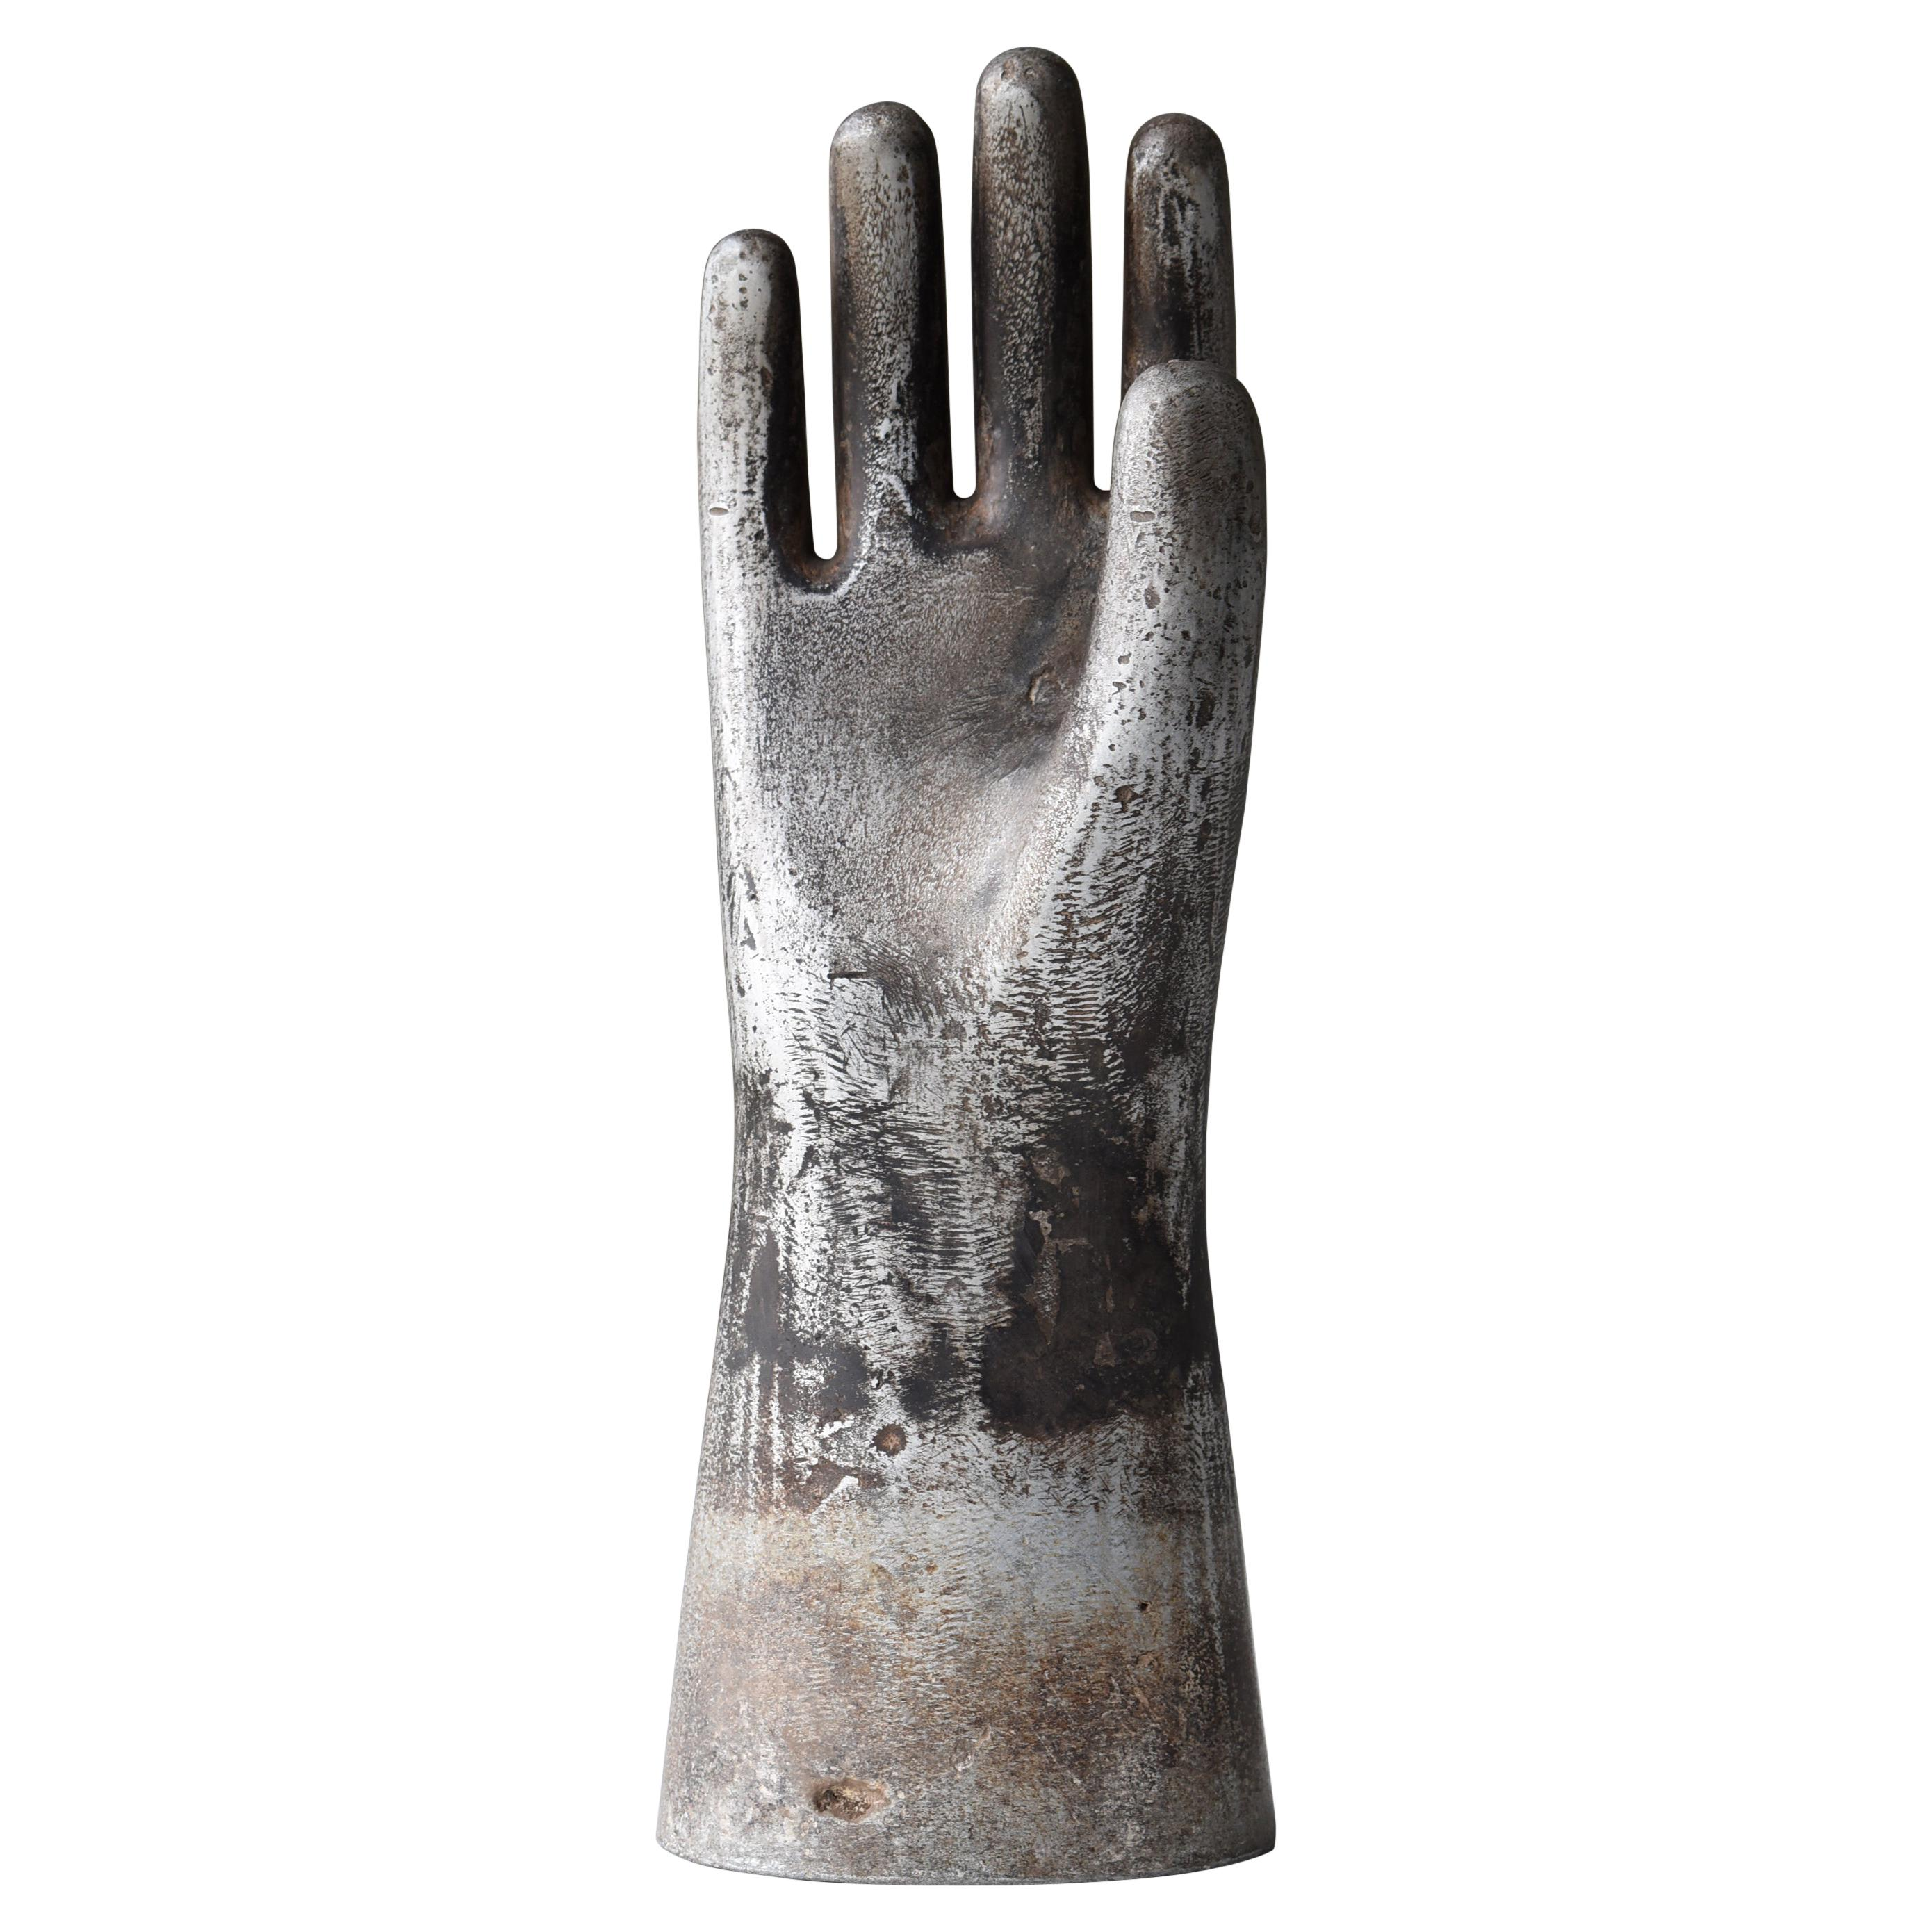 Japanese Old Aluminum Glove Mold 1920s-1950s/Hand Sculpture Figurine Vintage Art